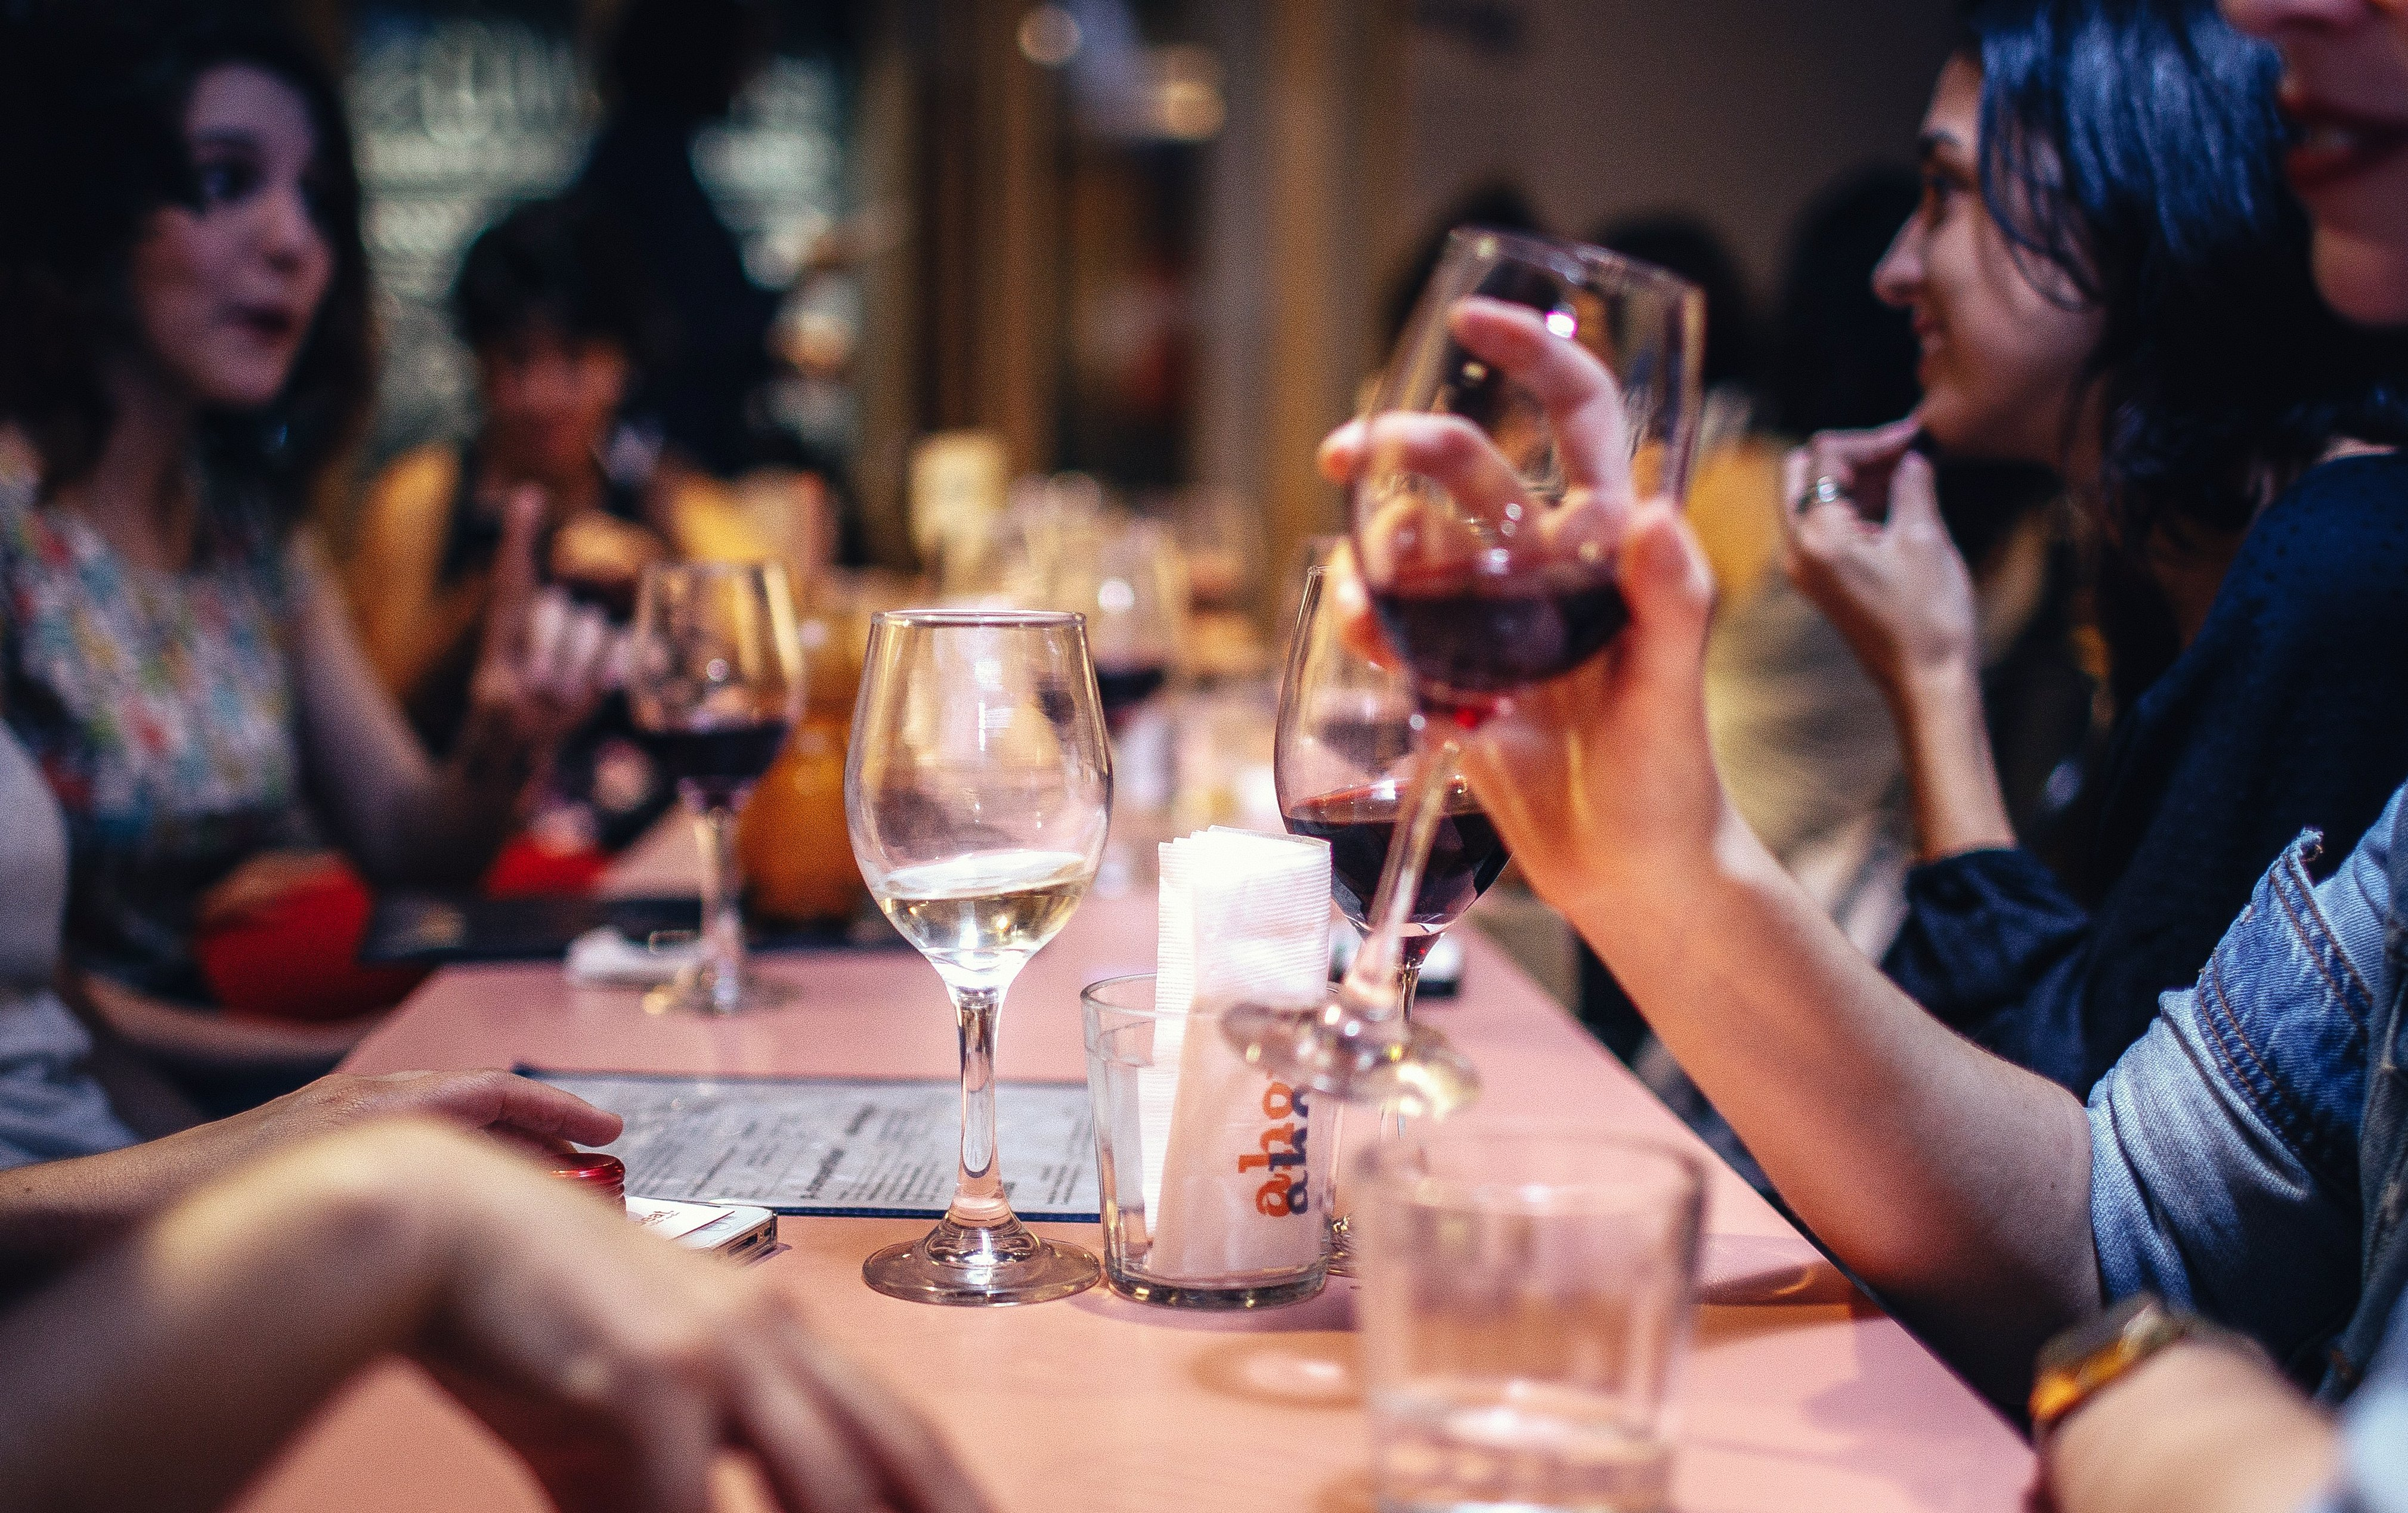 meet people abroad adult bar tourist